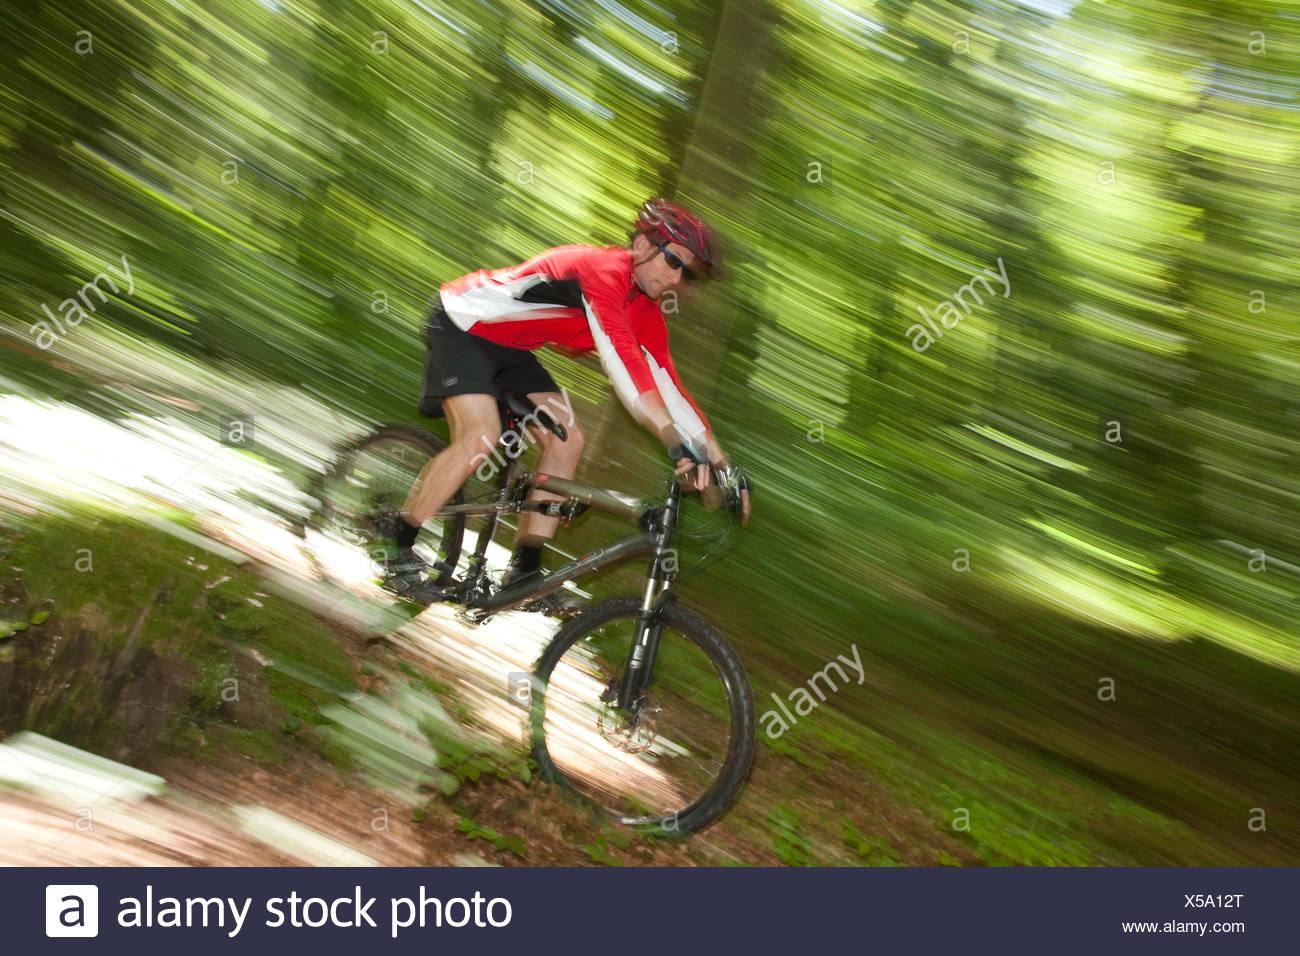 Switzerland Europe canton JU Jura mountain bike bike wheel bicycle bicycle bicycles riding a bicycle wood forest man wood - Stock Image